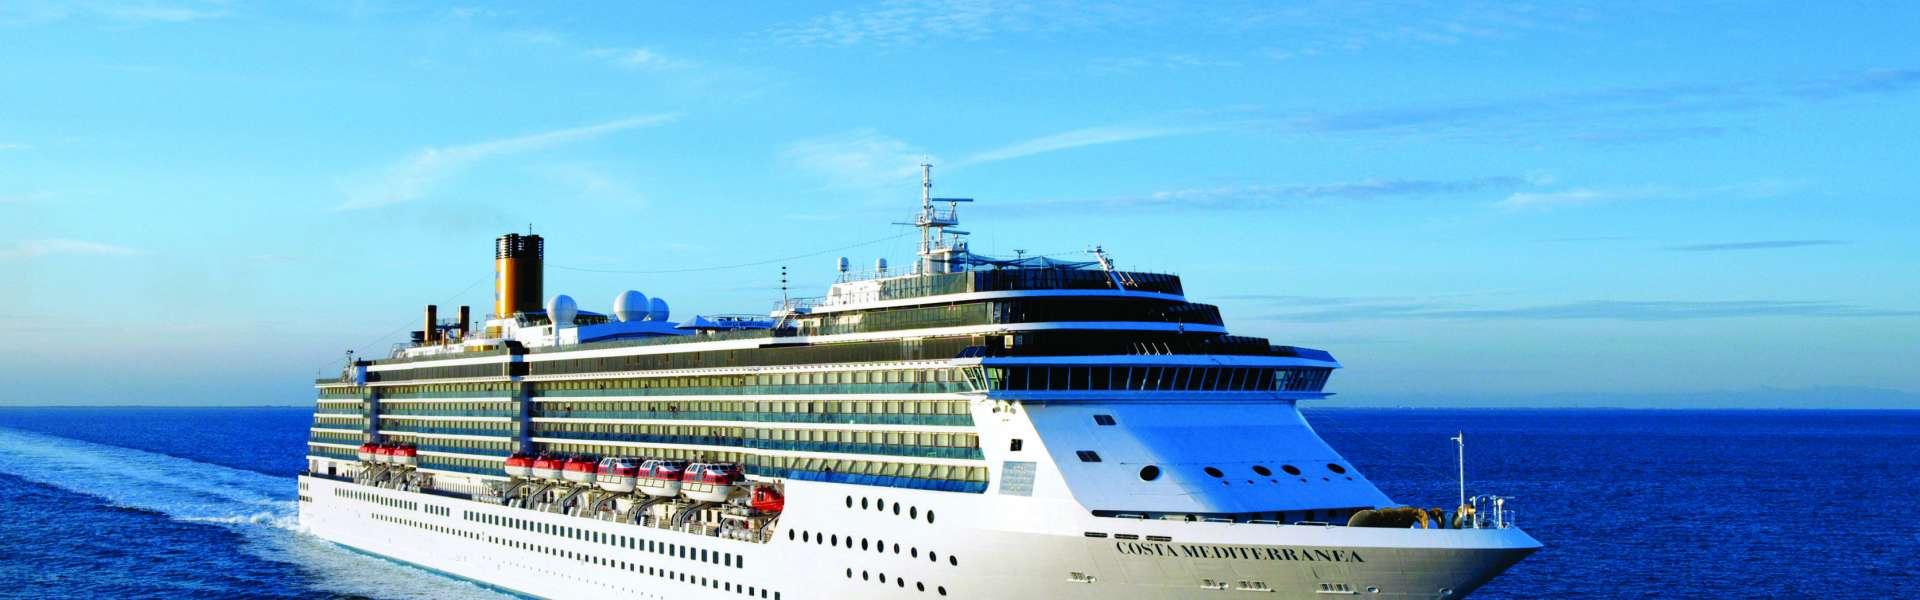 Croaziera 2019 - Asia/Africa si Orientul Mijlociu (Abu Dhabi) - Costa Cruises - Costa Mediteranea - 7 nopti